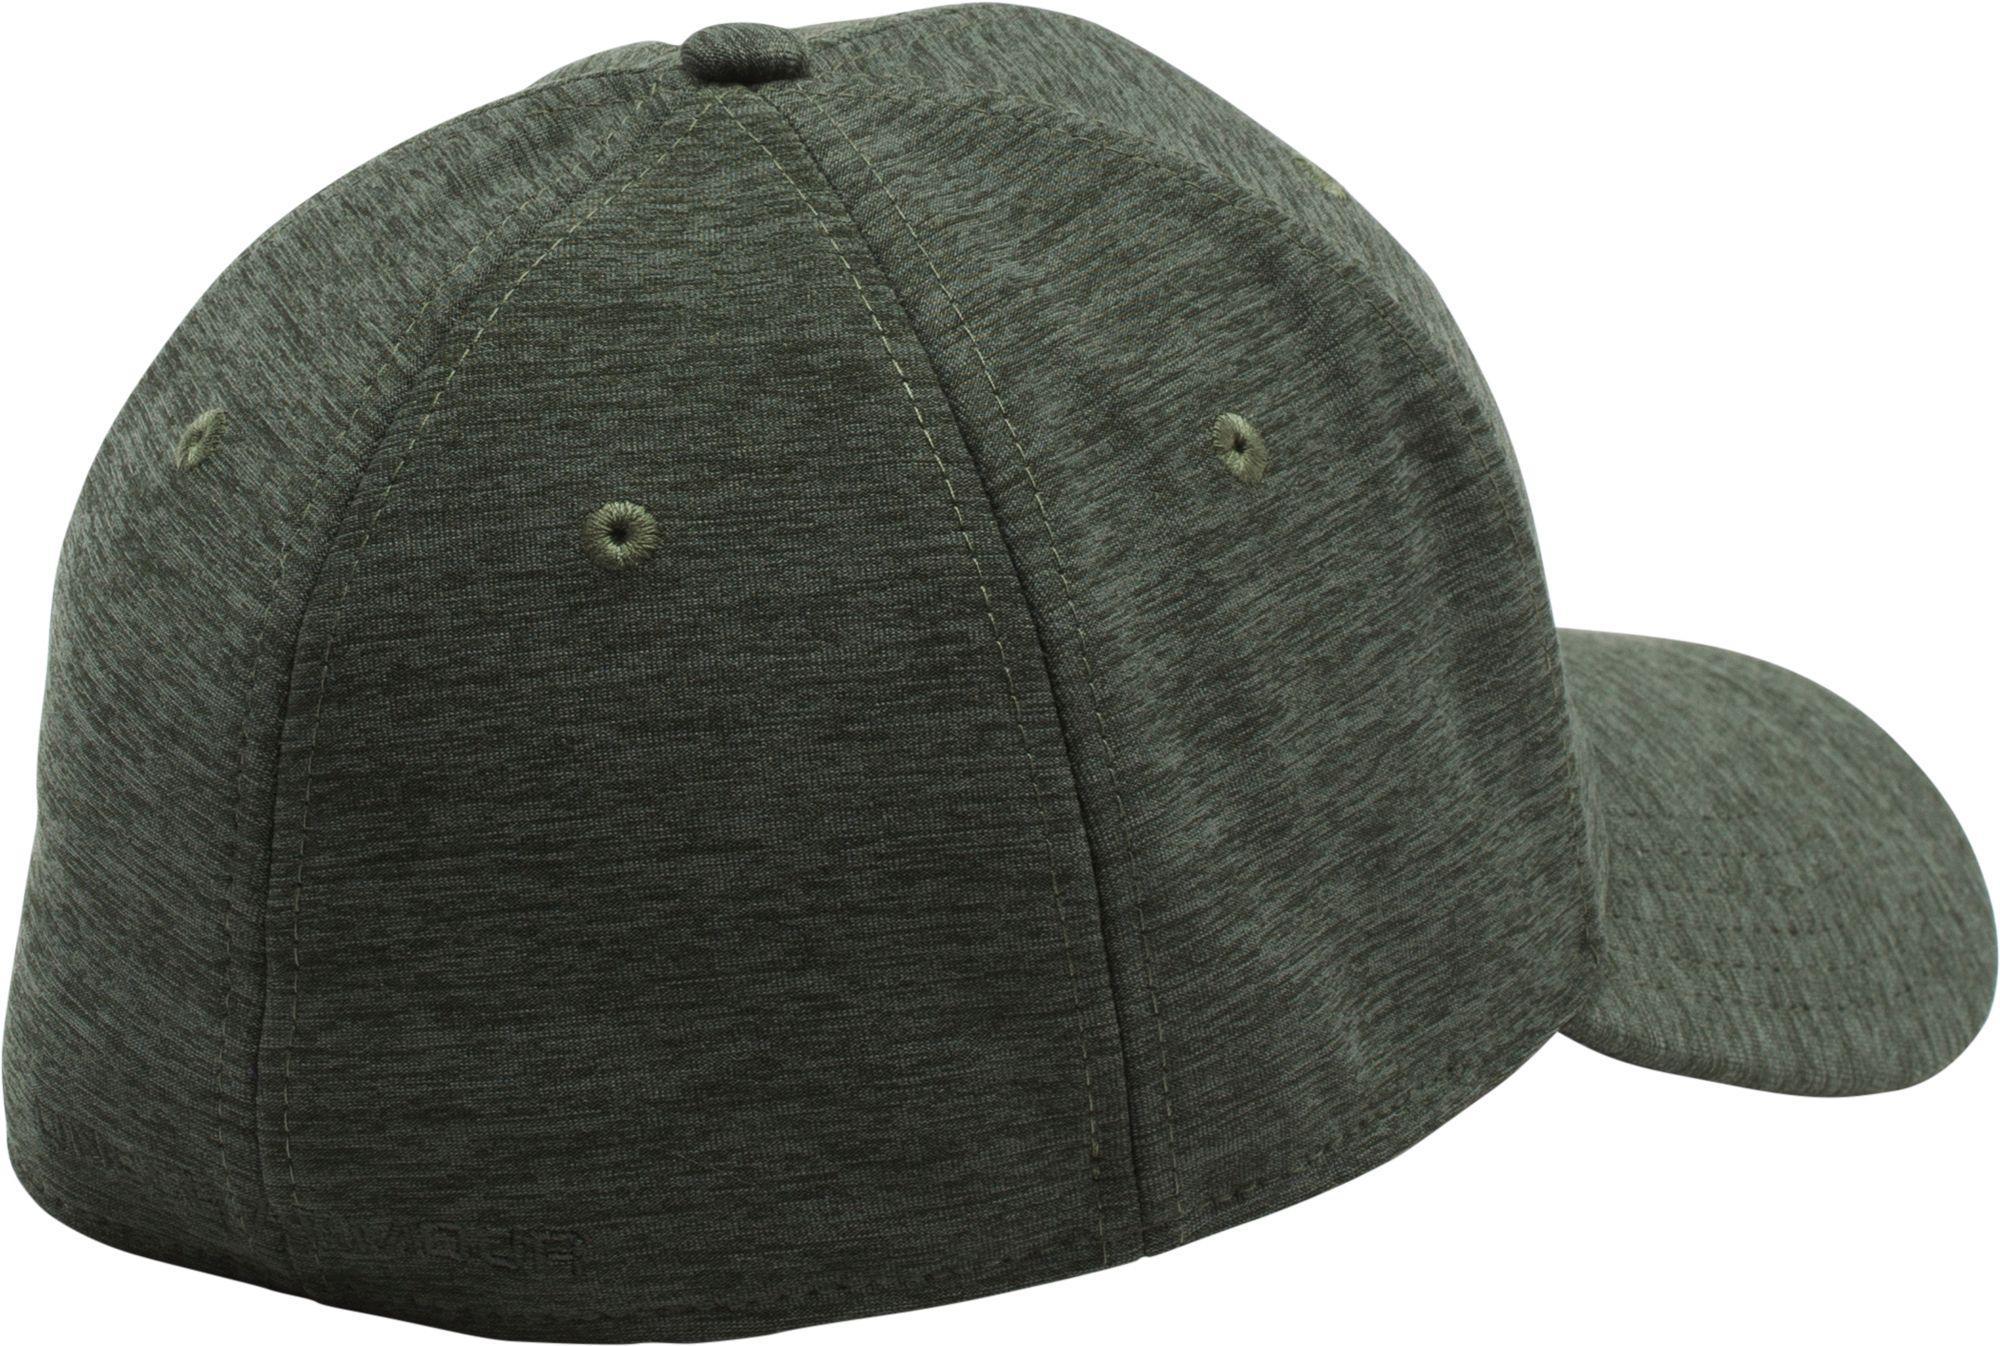 sports shoes 4fc08 6a372 Under Armour - Green Twist Print Tech Closer Hat for Men - Lyst